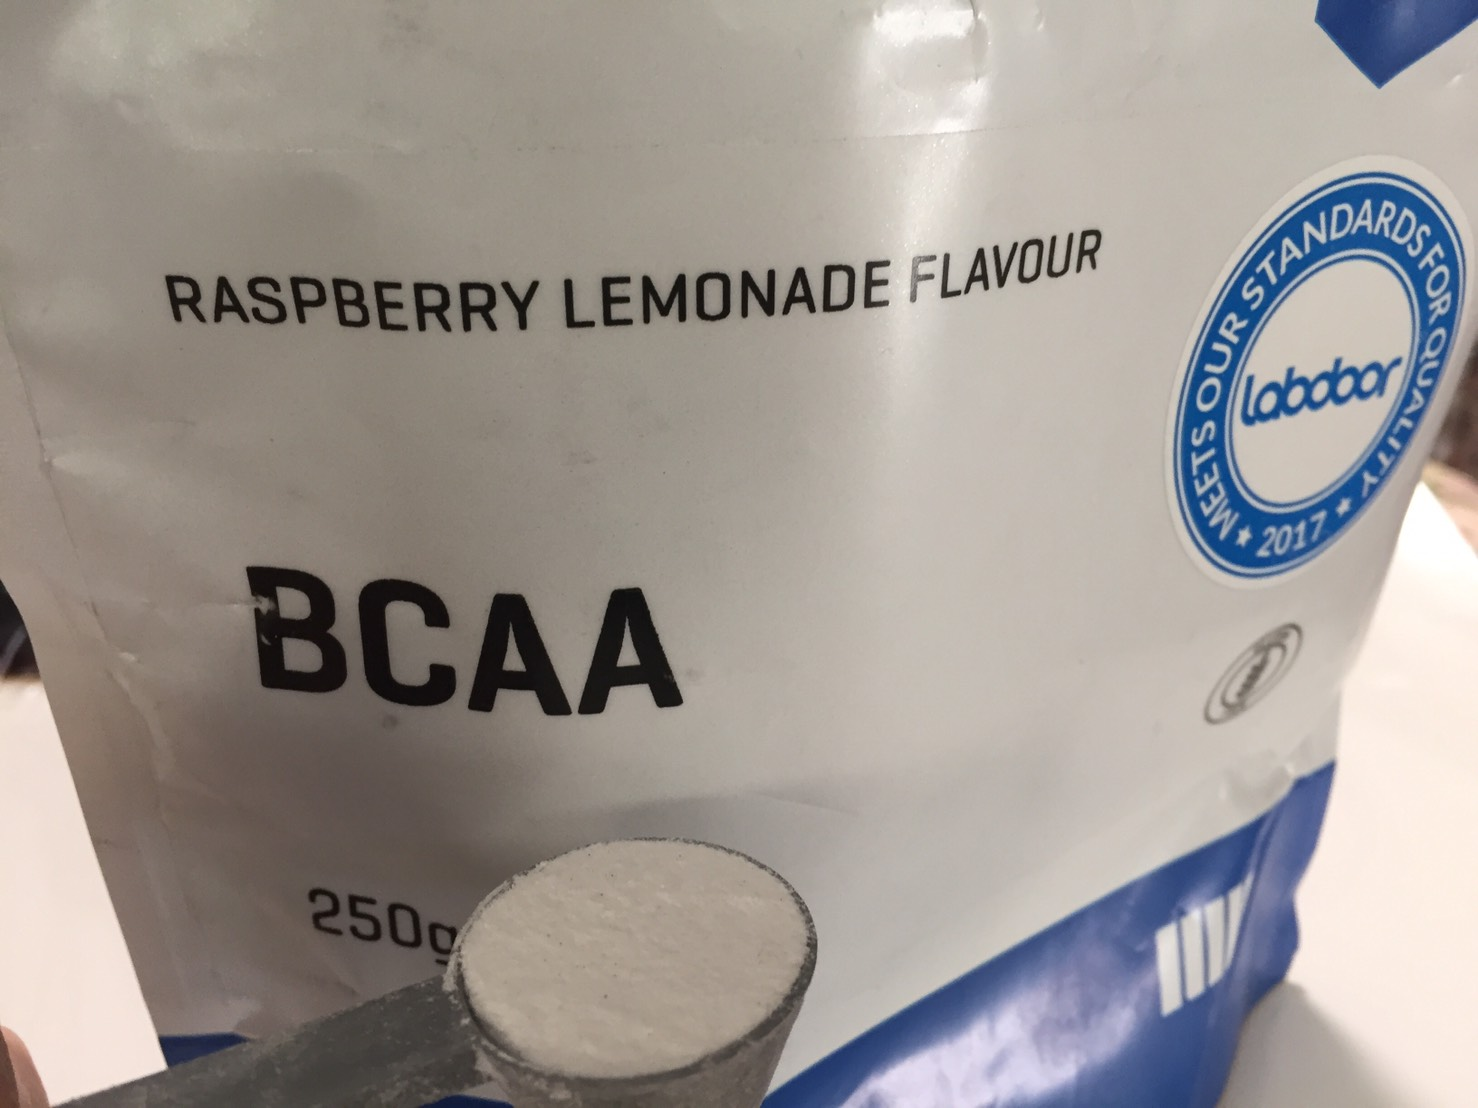 BCAA「ラズベリー・レモネード味(RASPBERRY LEMONADE FLAVOUR)」の様子